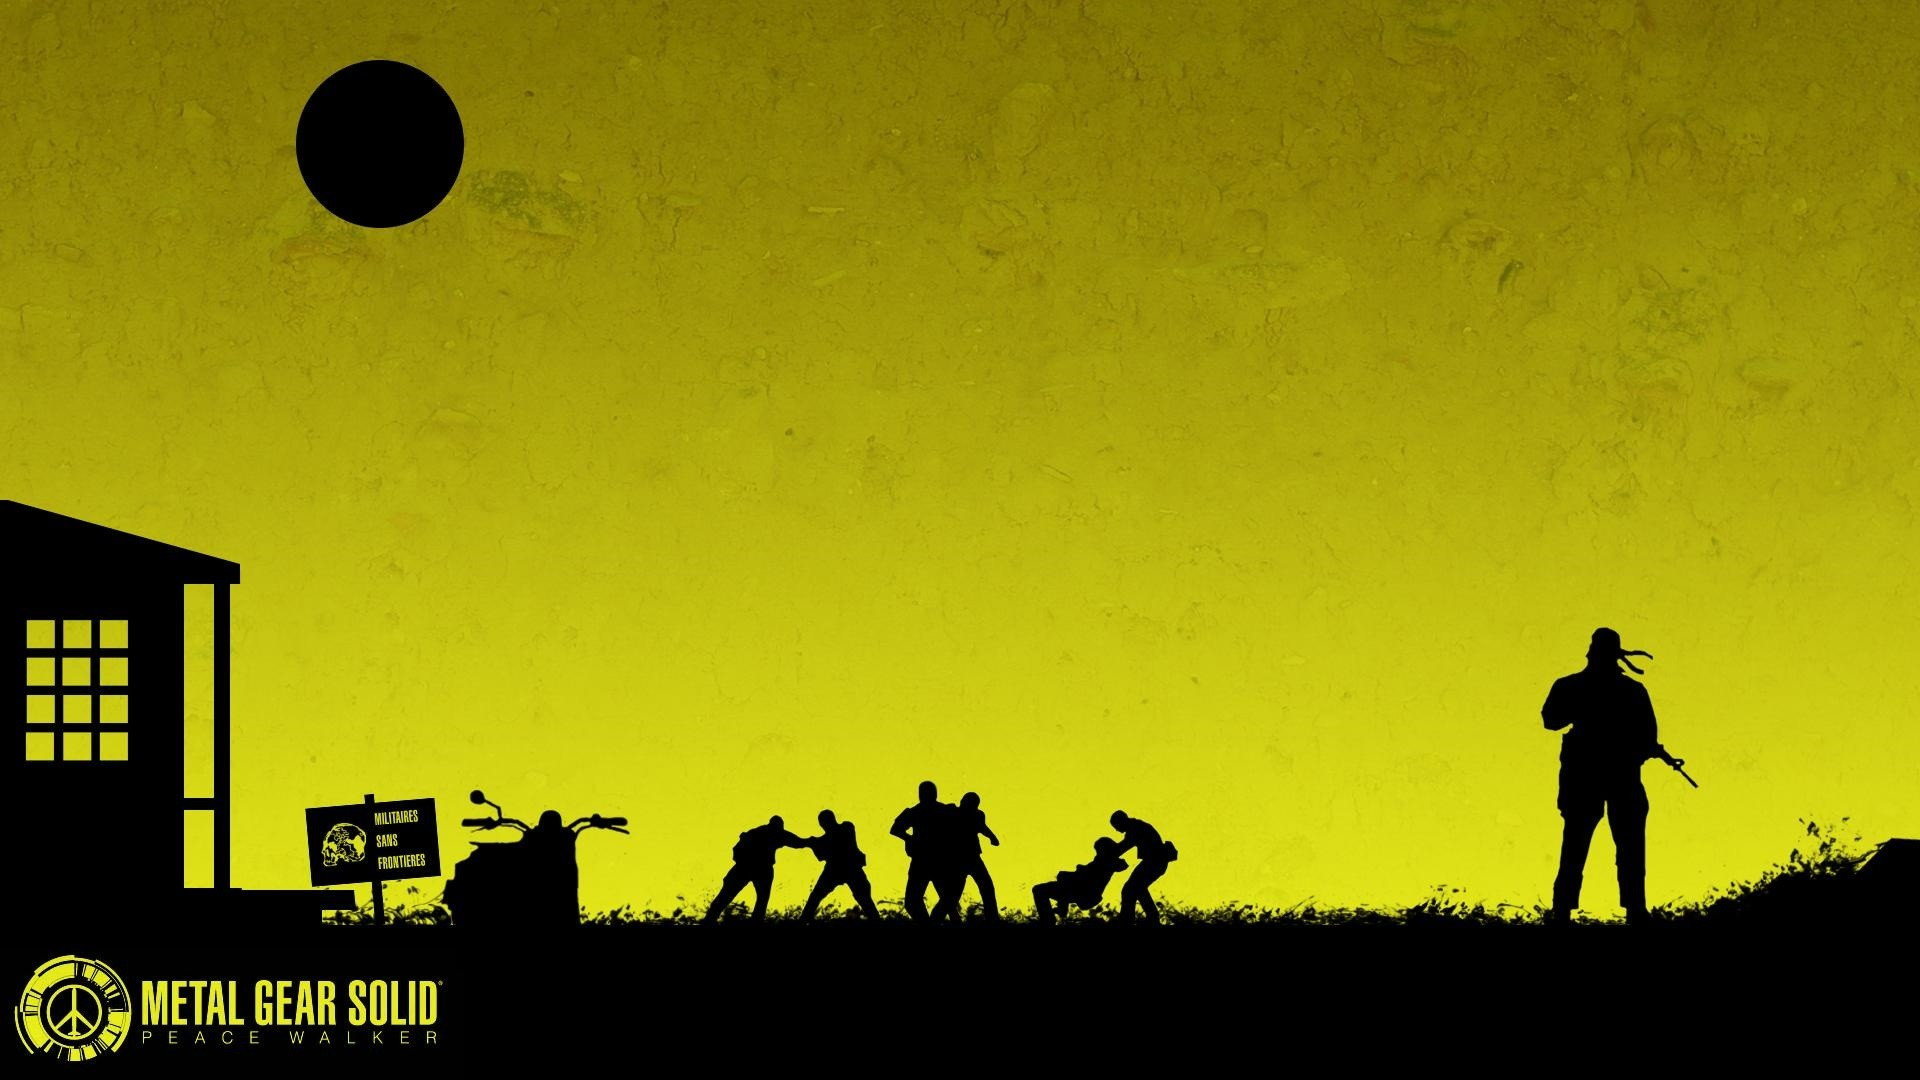 7 Metal Gear Solid: Peace Walker HD Wallpapers   Backgrounds – Wallpaper  Abyss